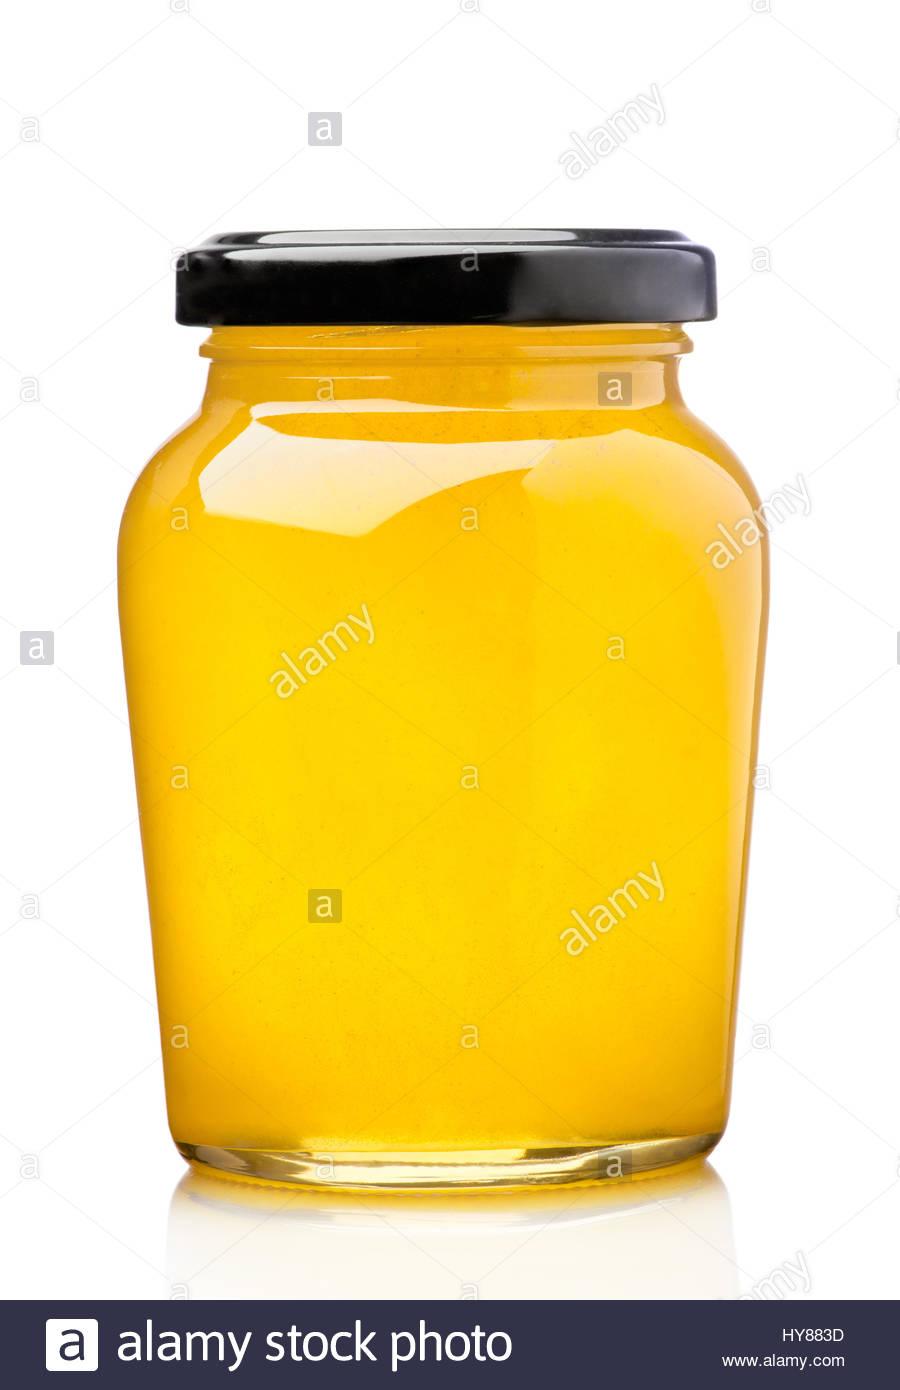 Honey pot preserved, isolated on white - Stock Image